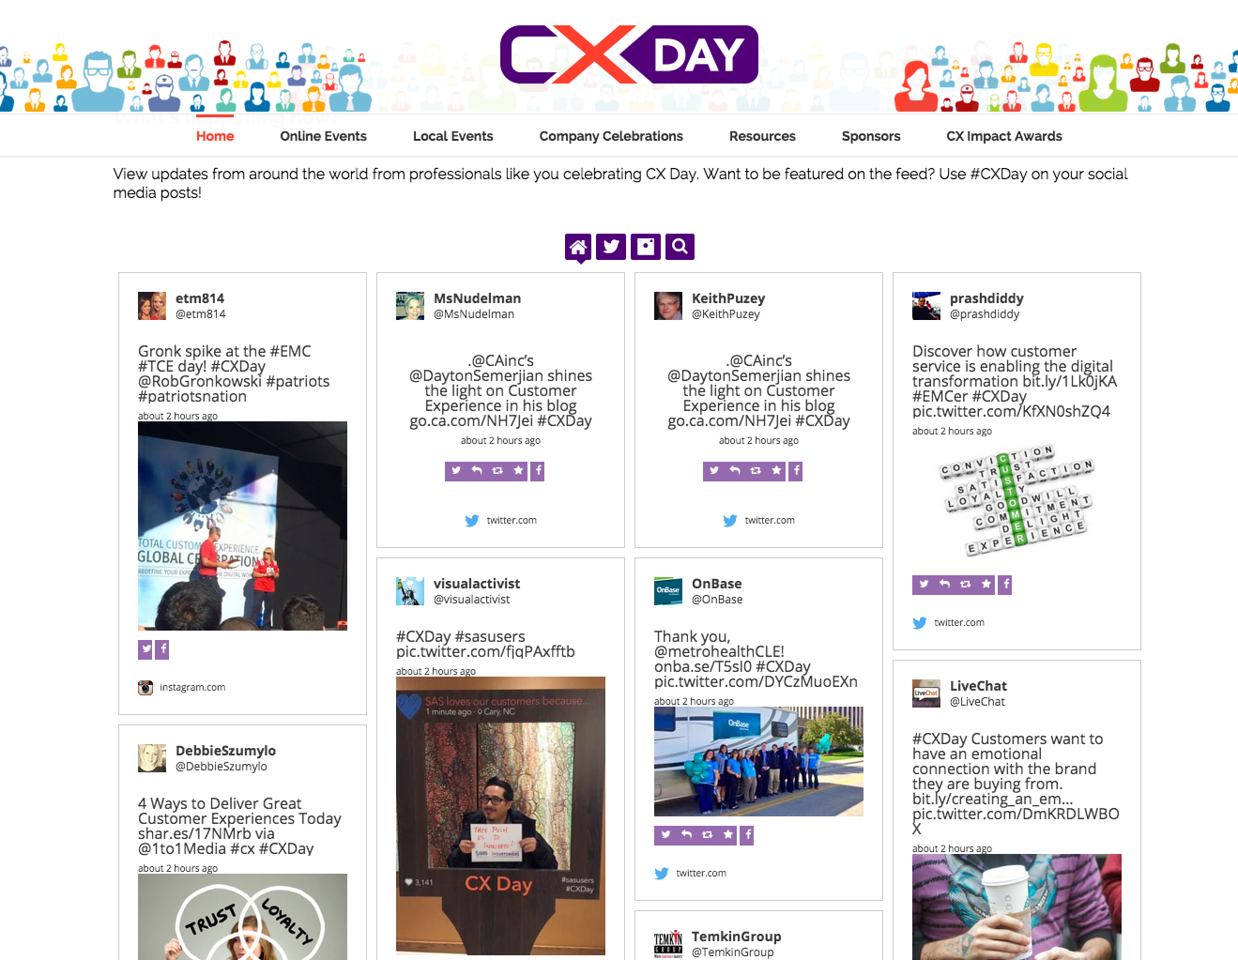 #CXDAY